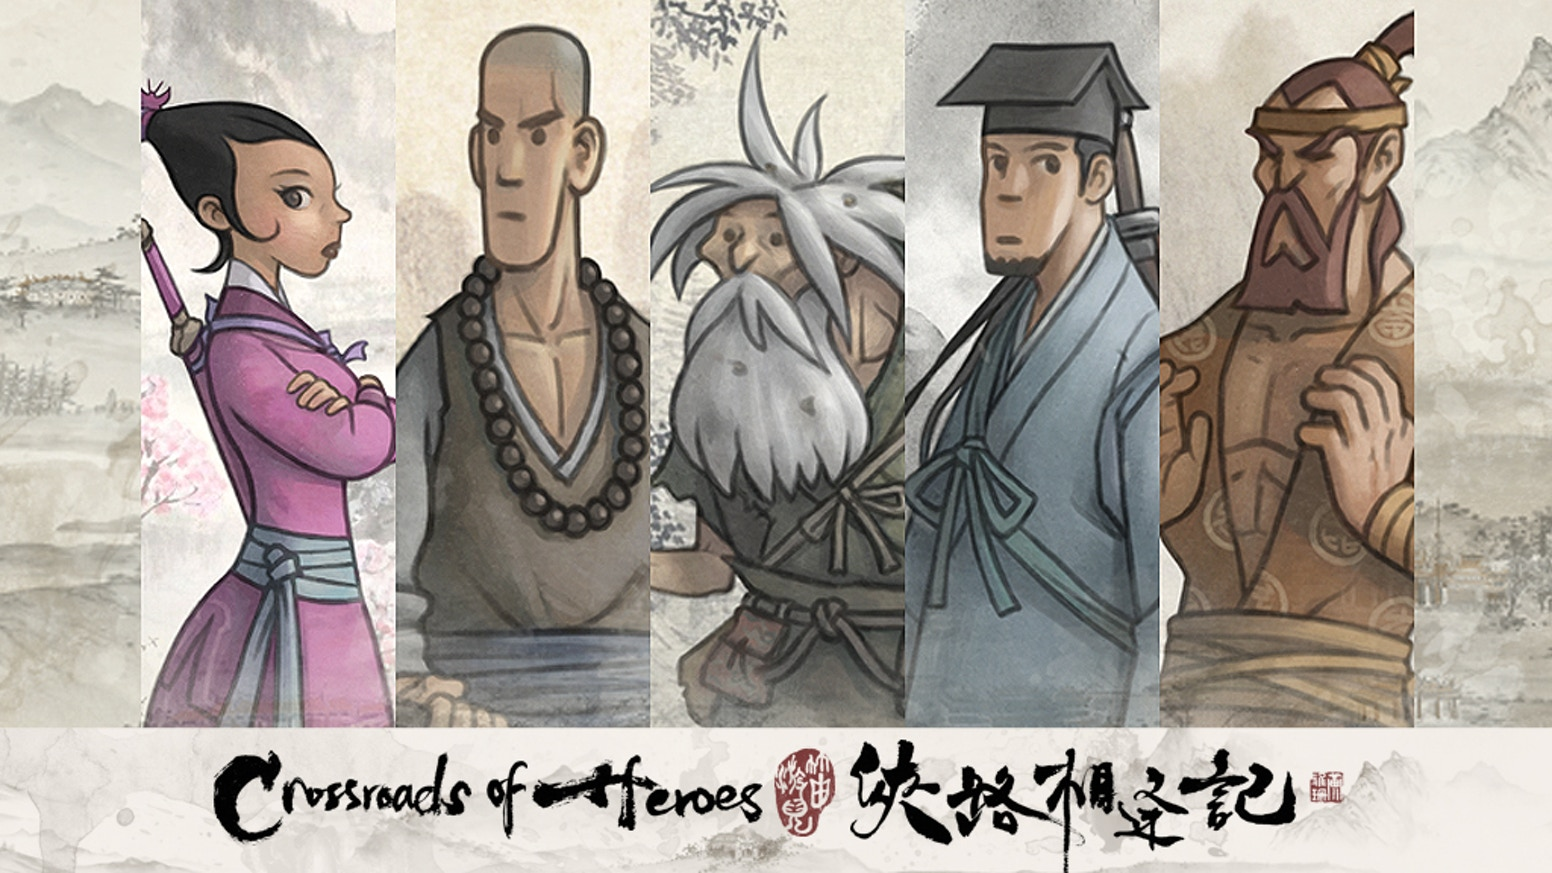 Crossroads of Heroes by Pat Piper » Community — Kickstarter